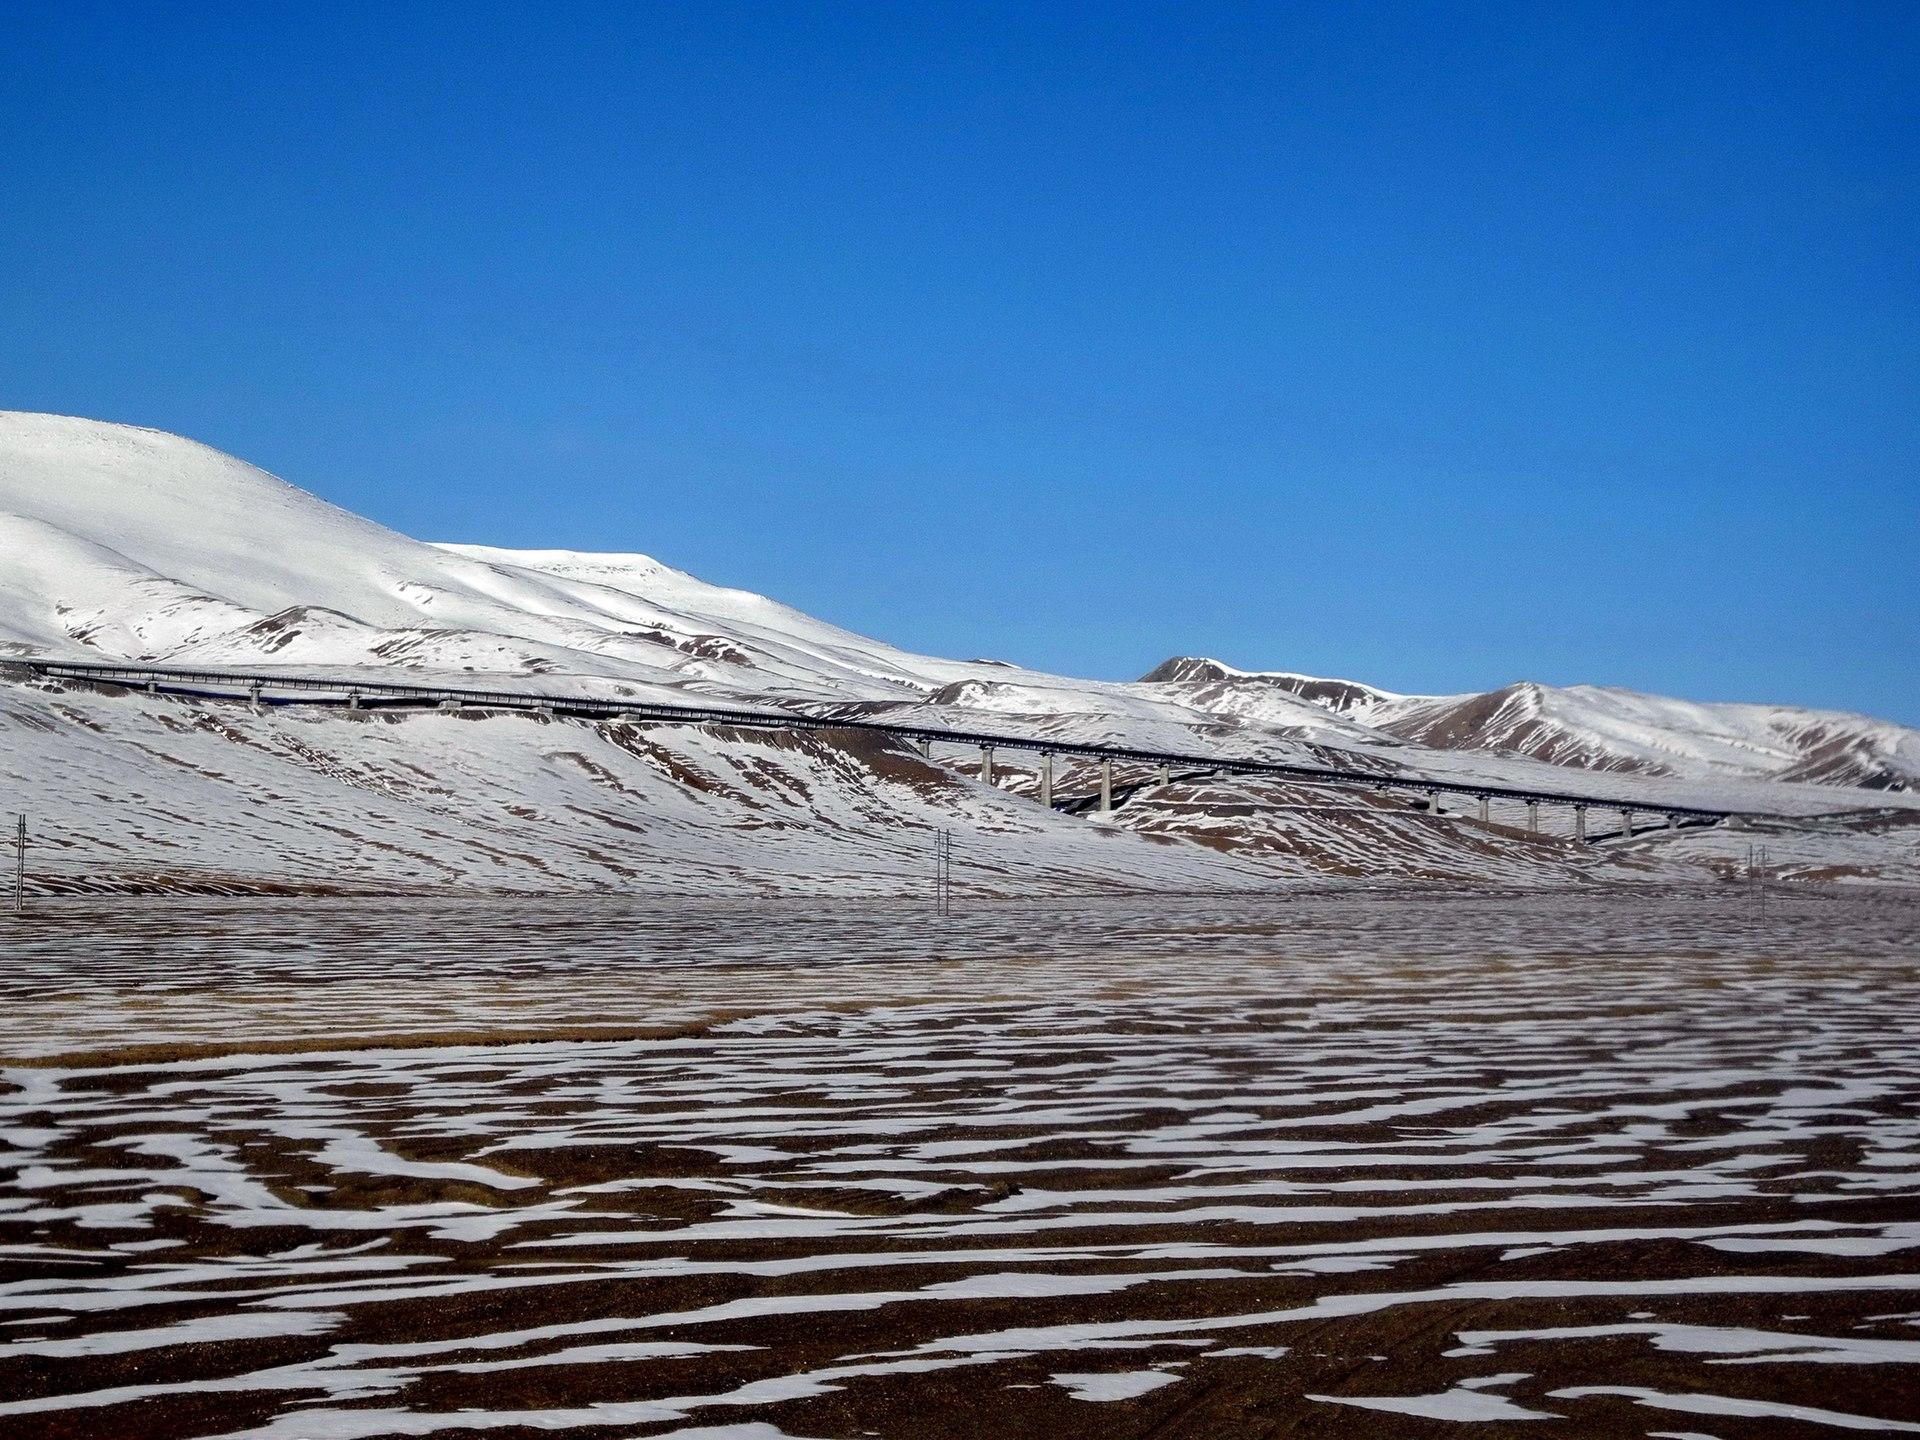 Prefectura autónoma mongol y tibetana de Haixi - Wikipedia ...